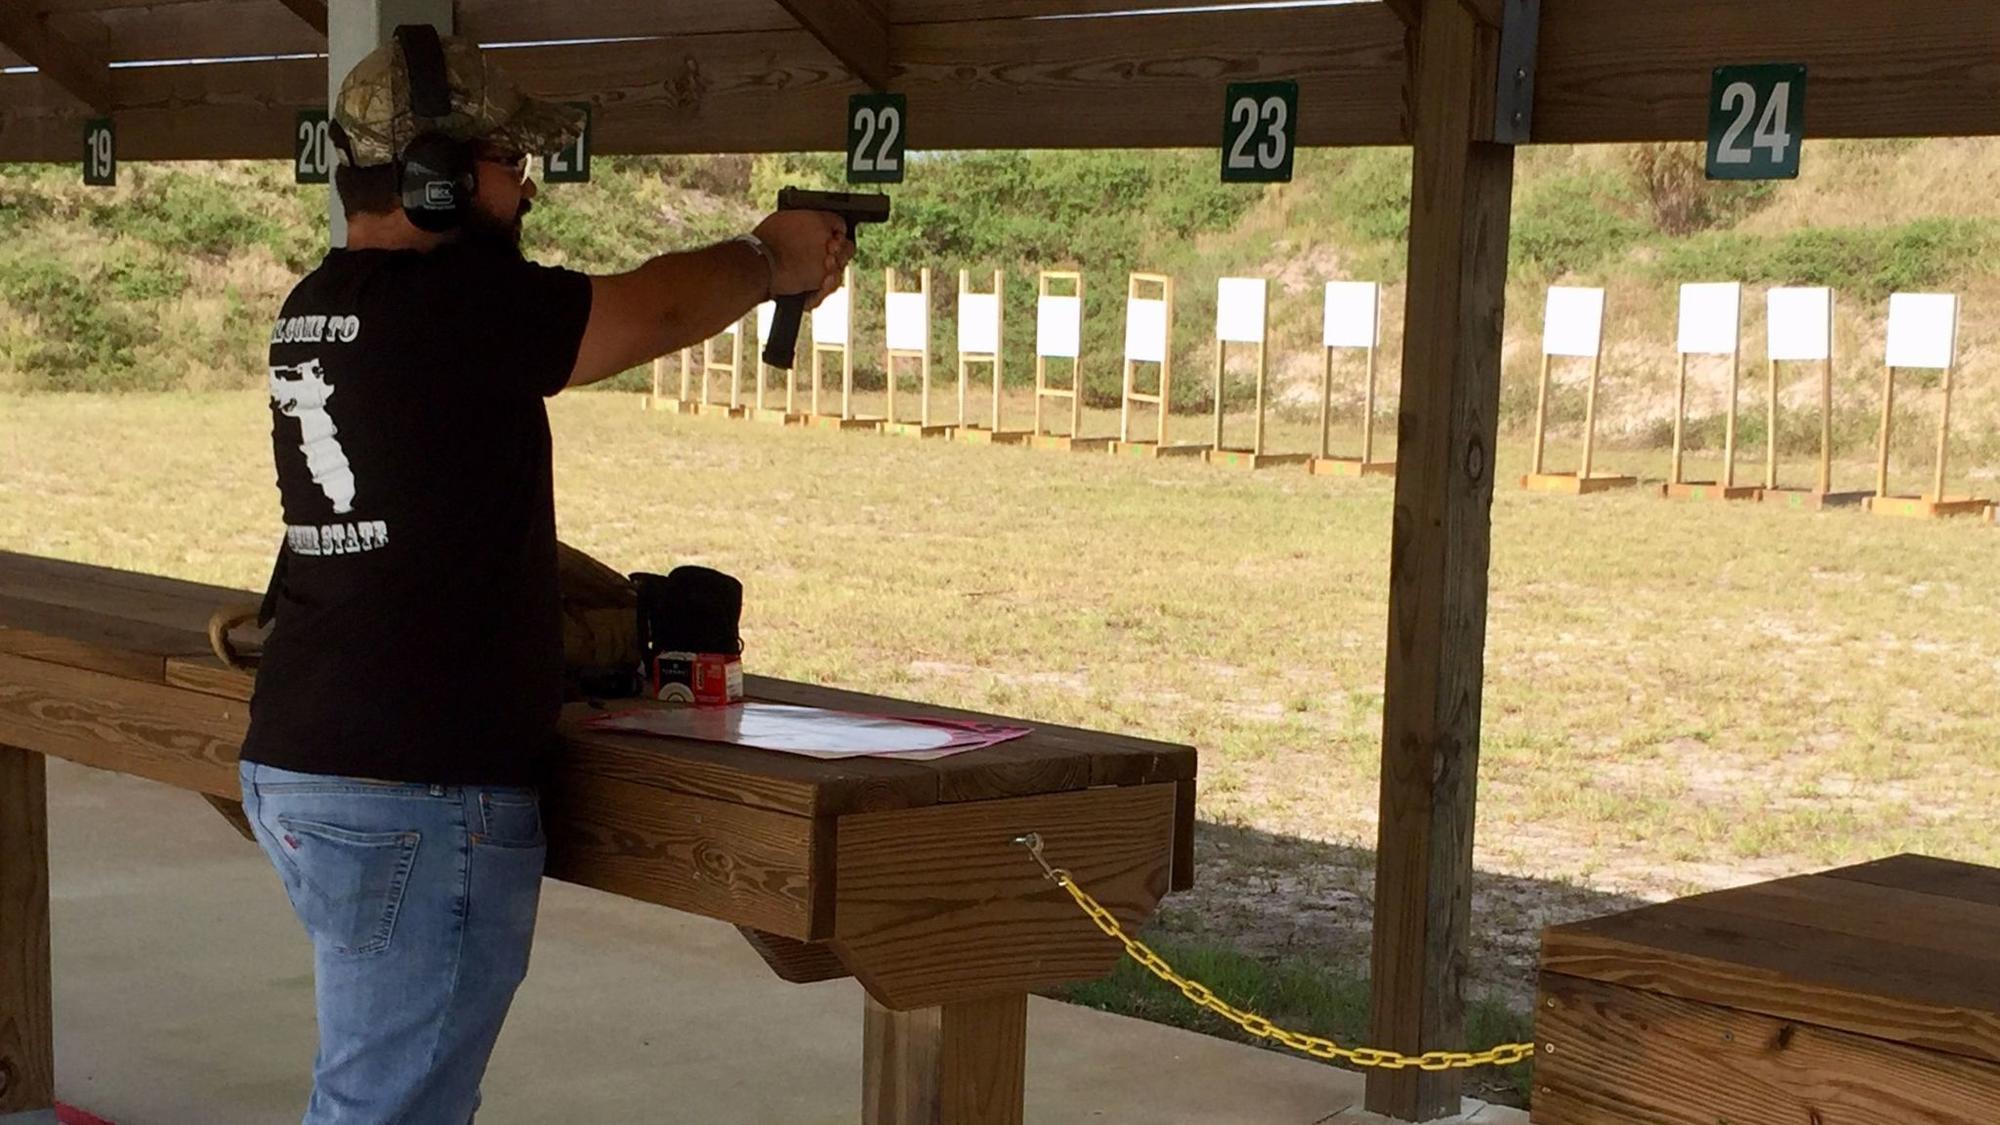 Shooting Range Orlando >> New public gun range opens in rural slice of Osceola - Orlando Sentinel